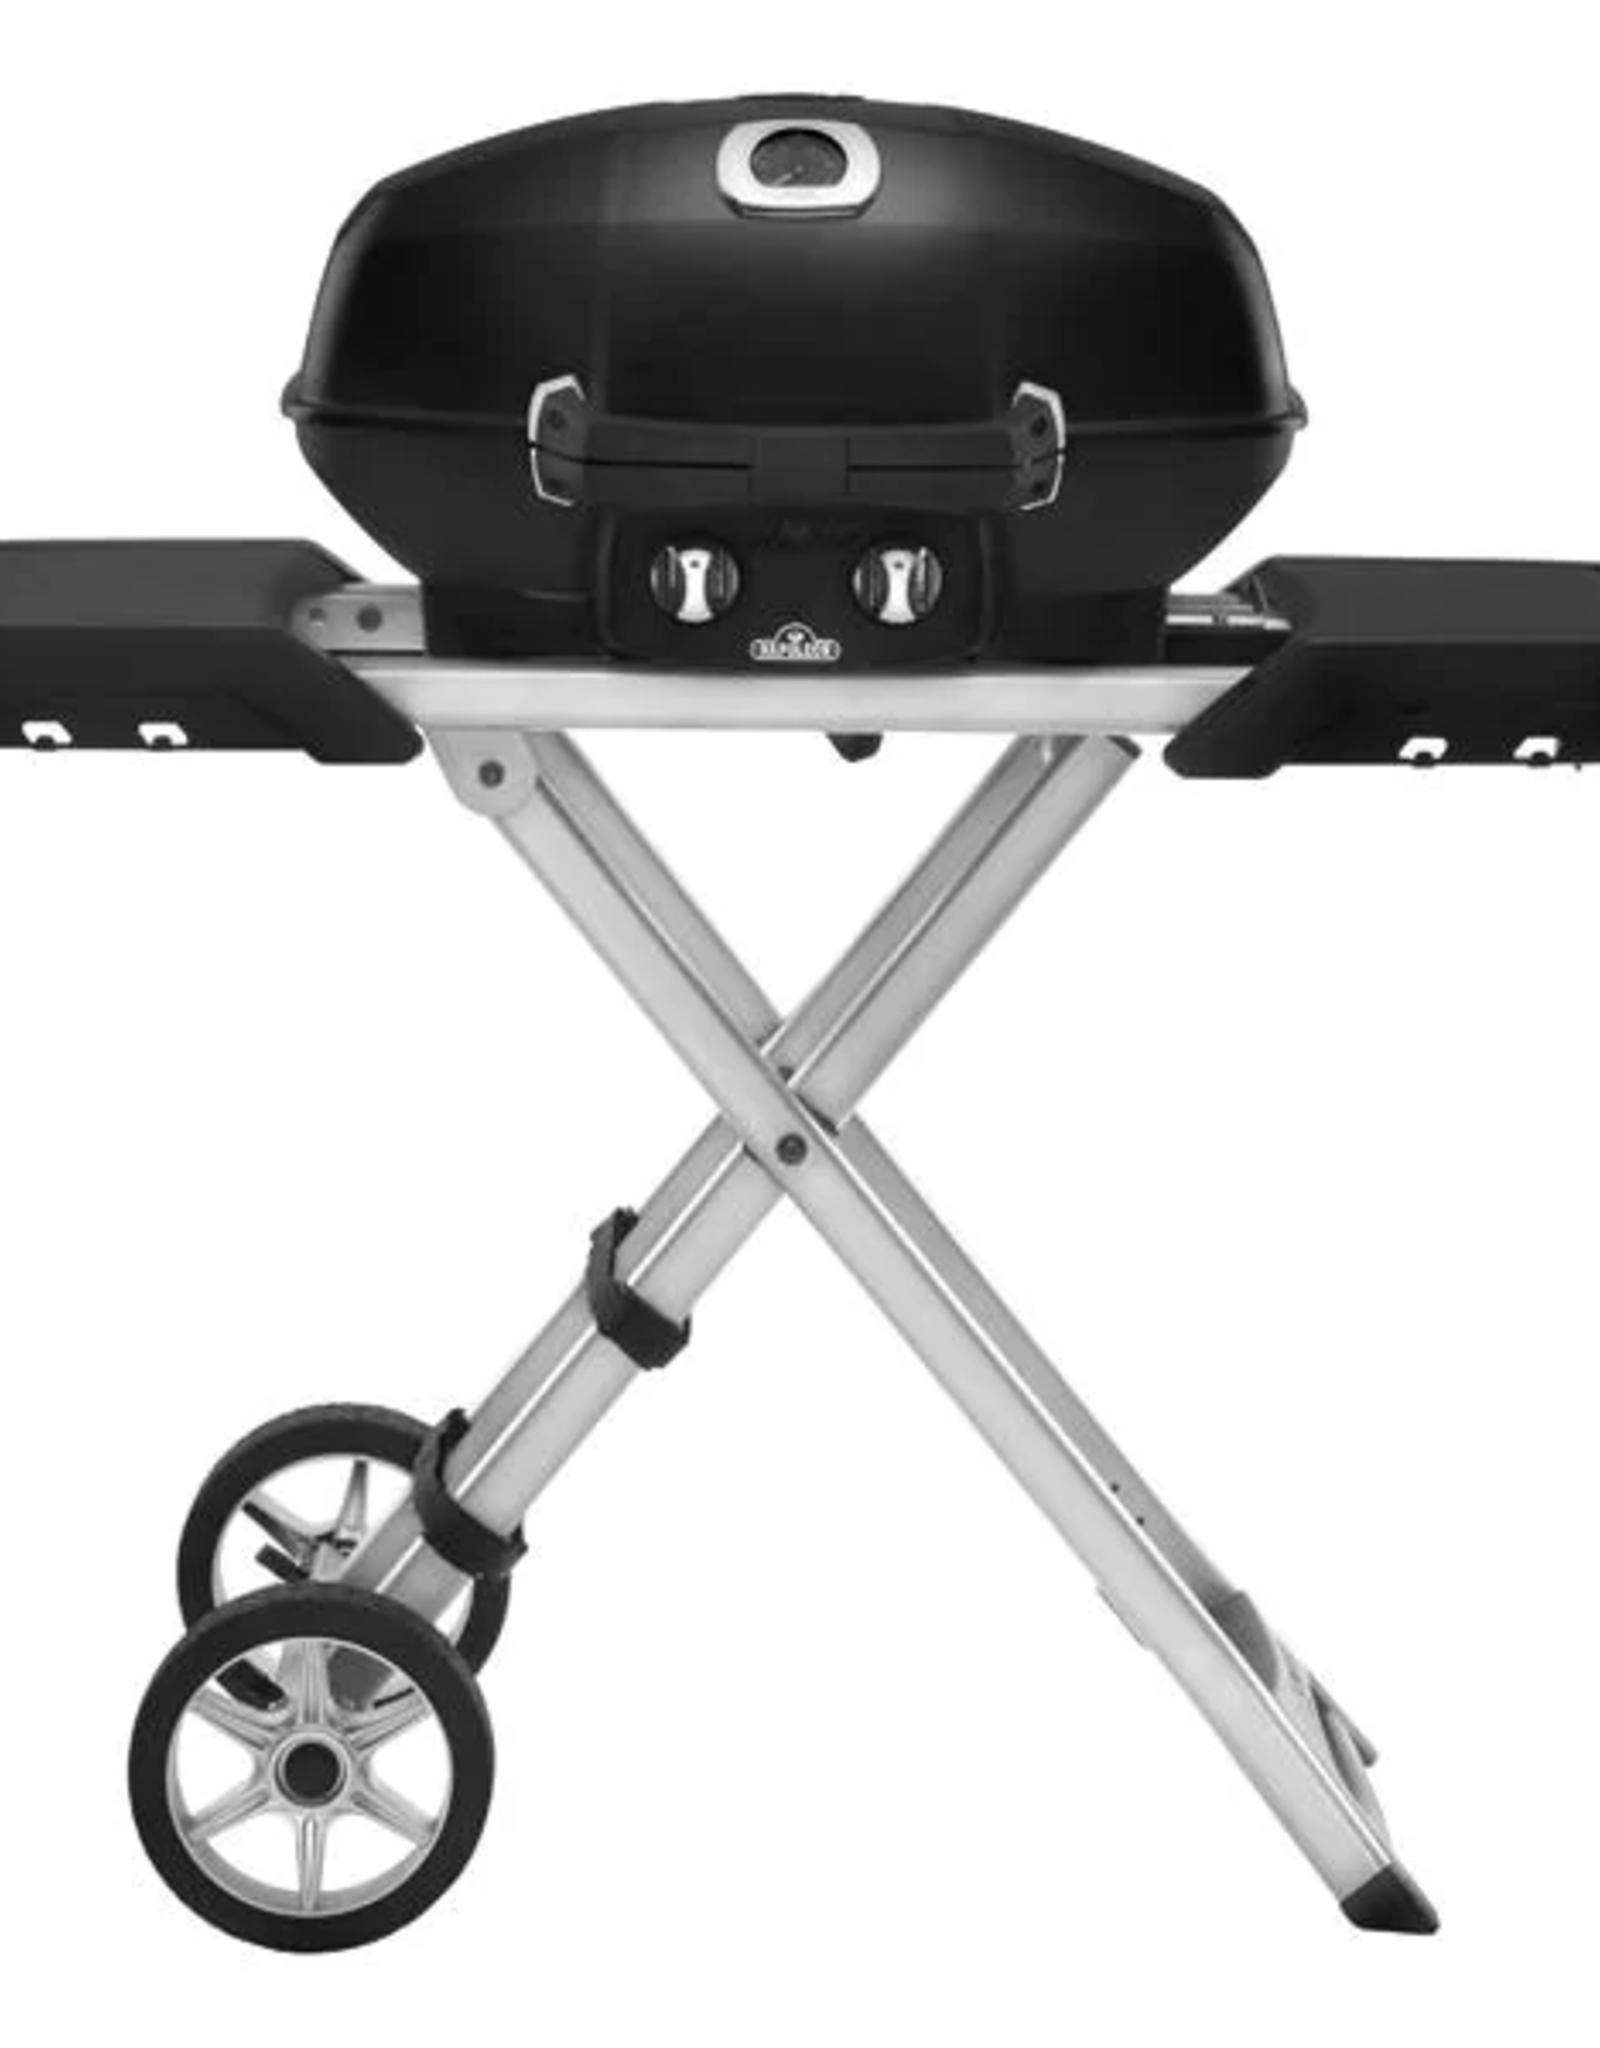 Napoleon Napoleon TravelQ Pro 285X Portable Freestanding Propane Gas Grill - Black - PRO285X-BK